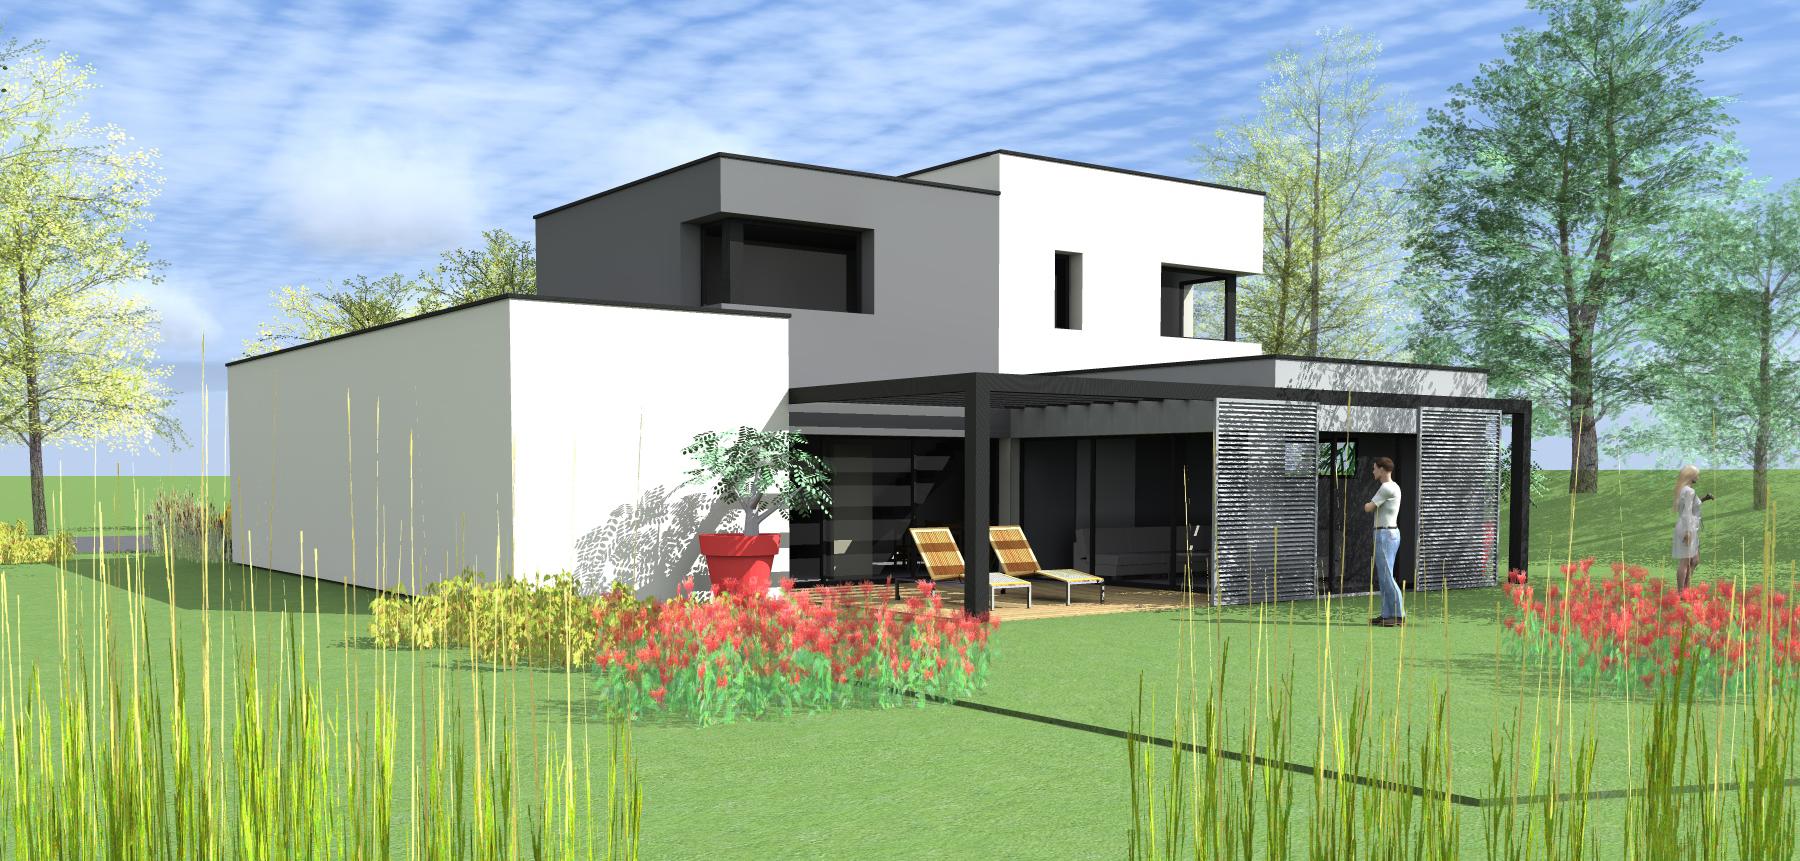 Projet b b 1 2 vue architecte lise roturier rennes for Maison moderne rennes